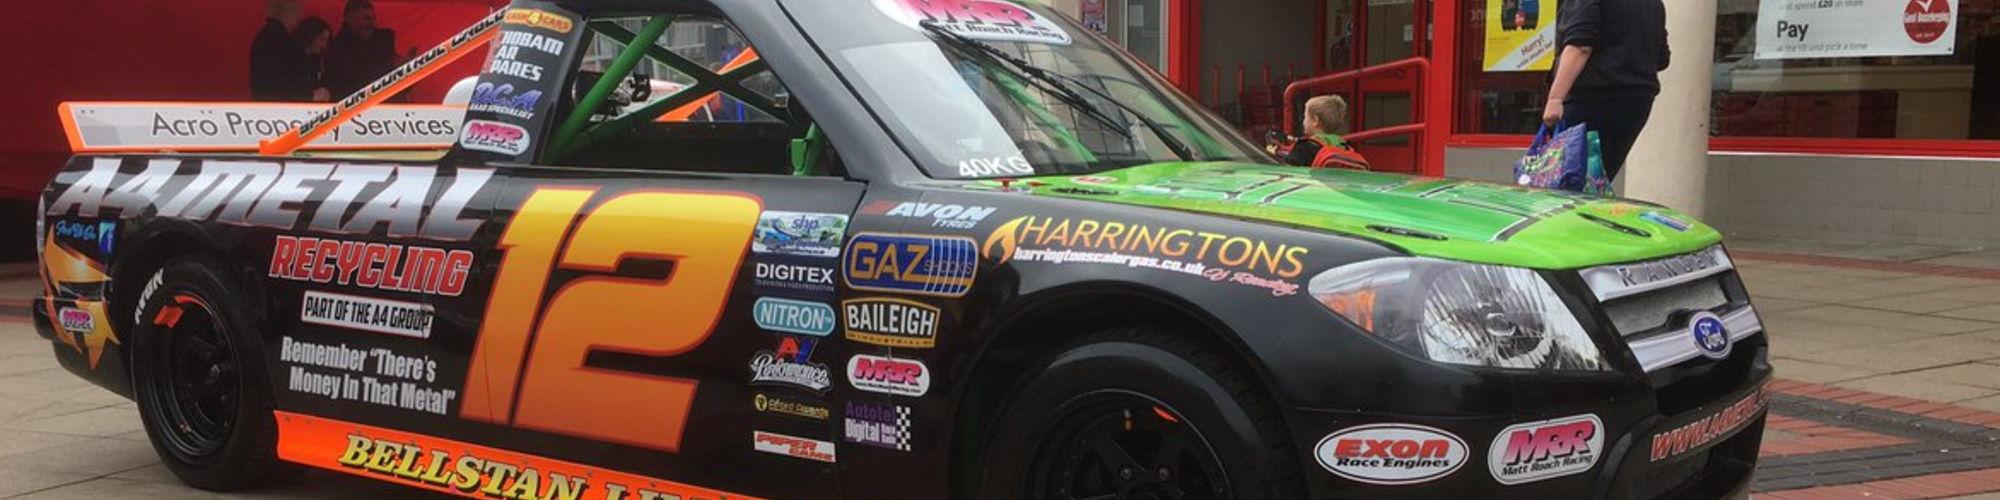 Matt Roach Racing LTD  cover image